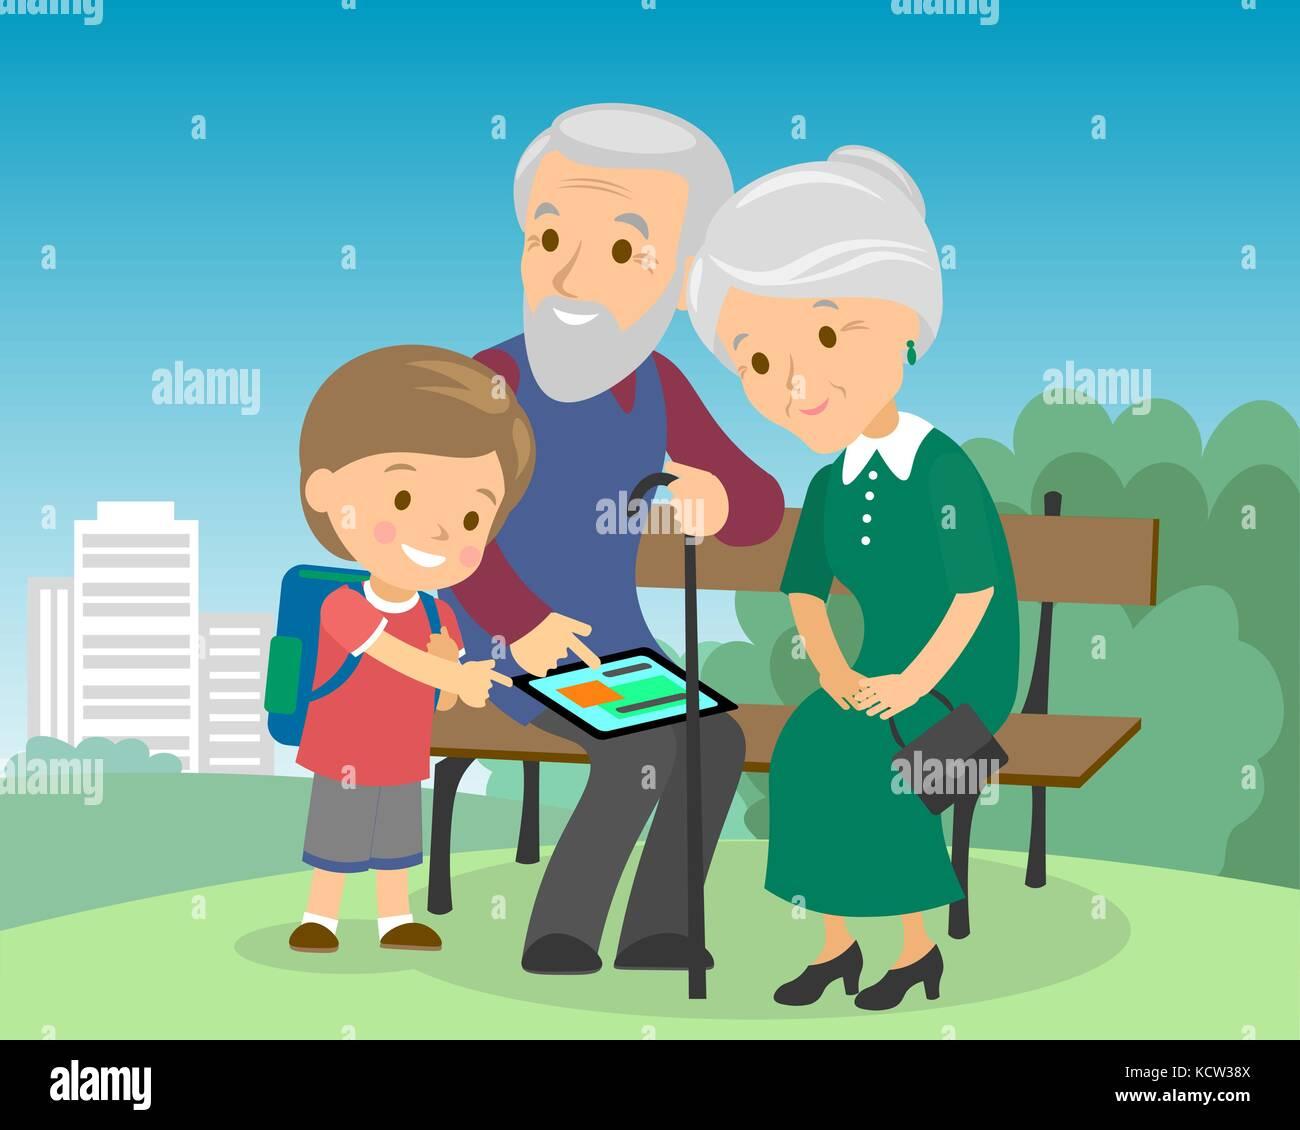 Grandson boy teach grandparents use tablet pc. Seniors elderly learning education modern technology internet computer - Stock Vector